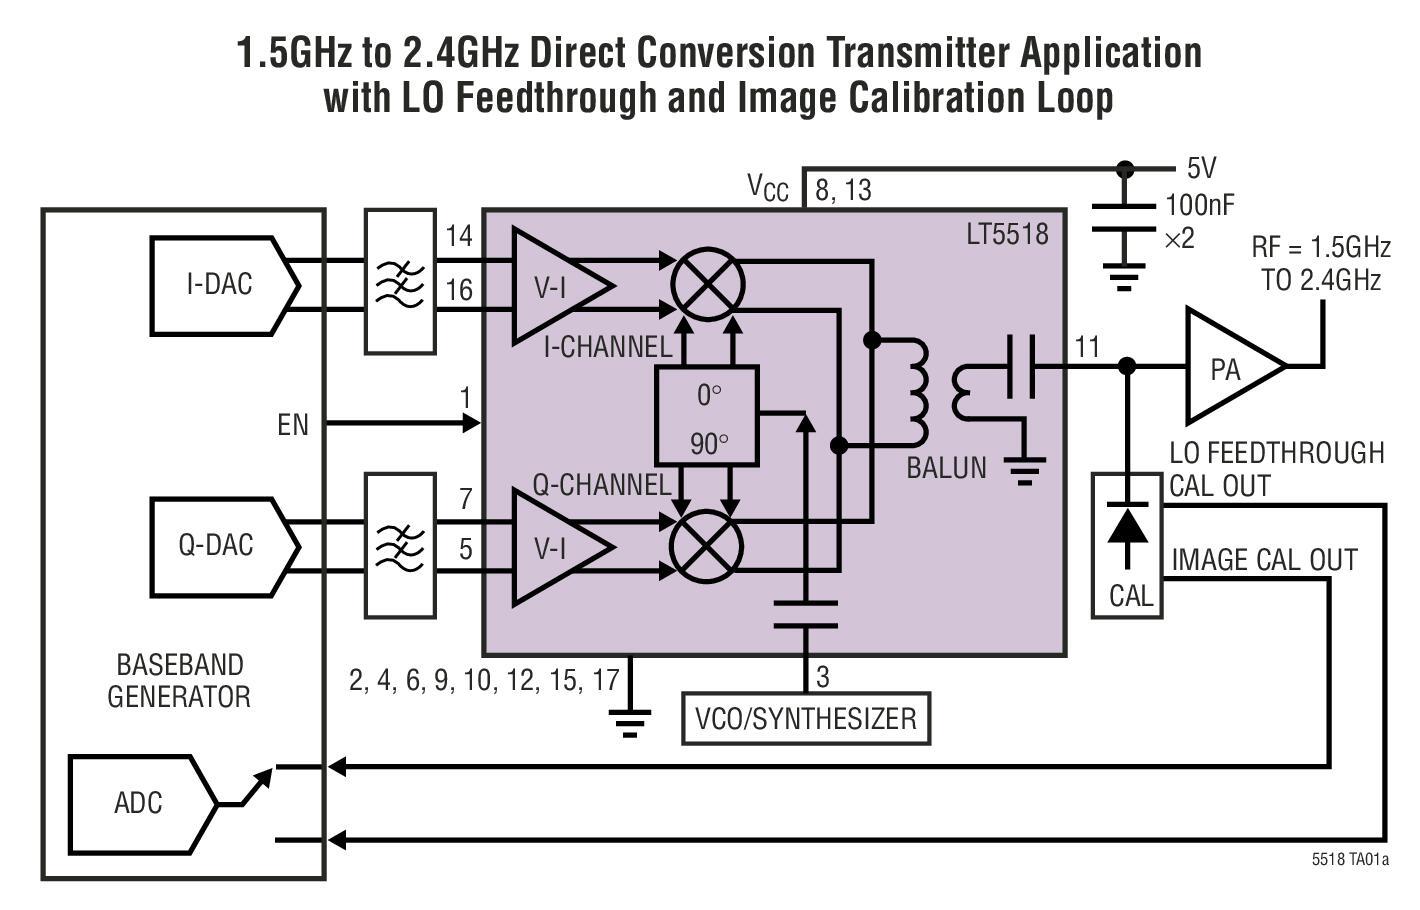 基于LT5518_Typical Application调制器的参考设计